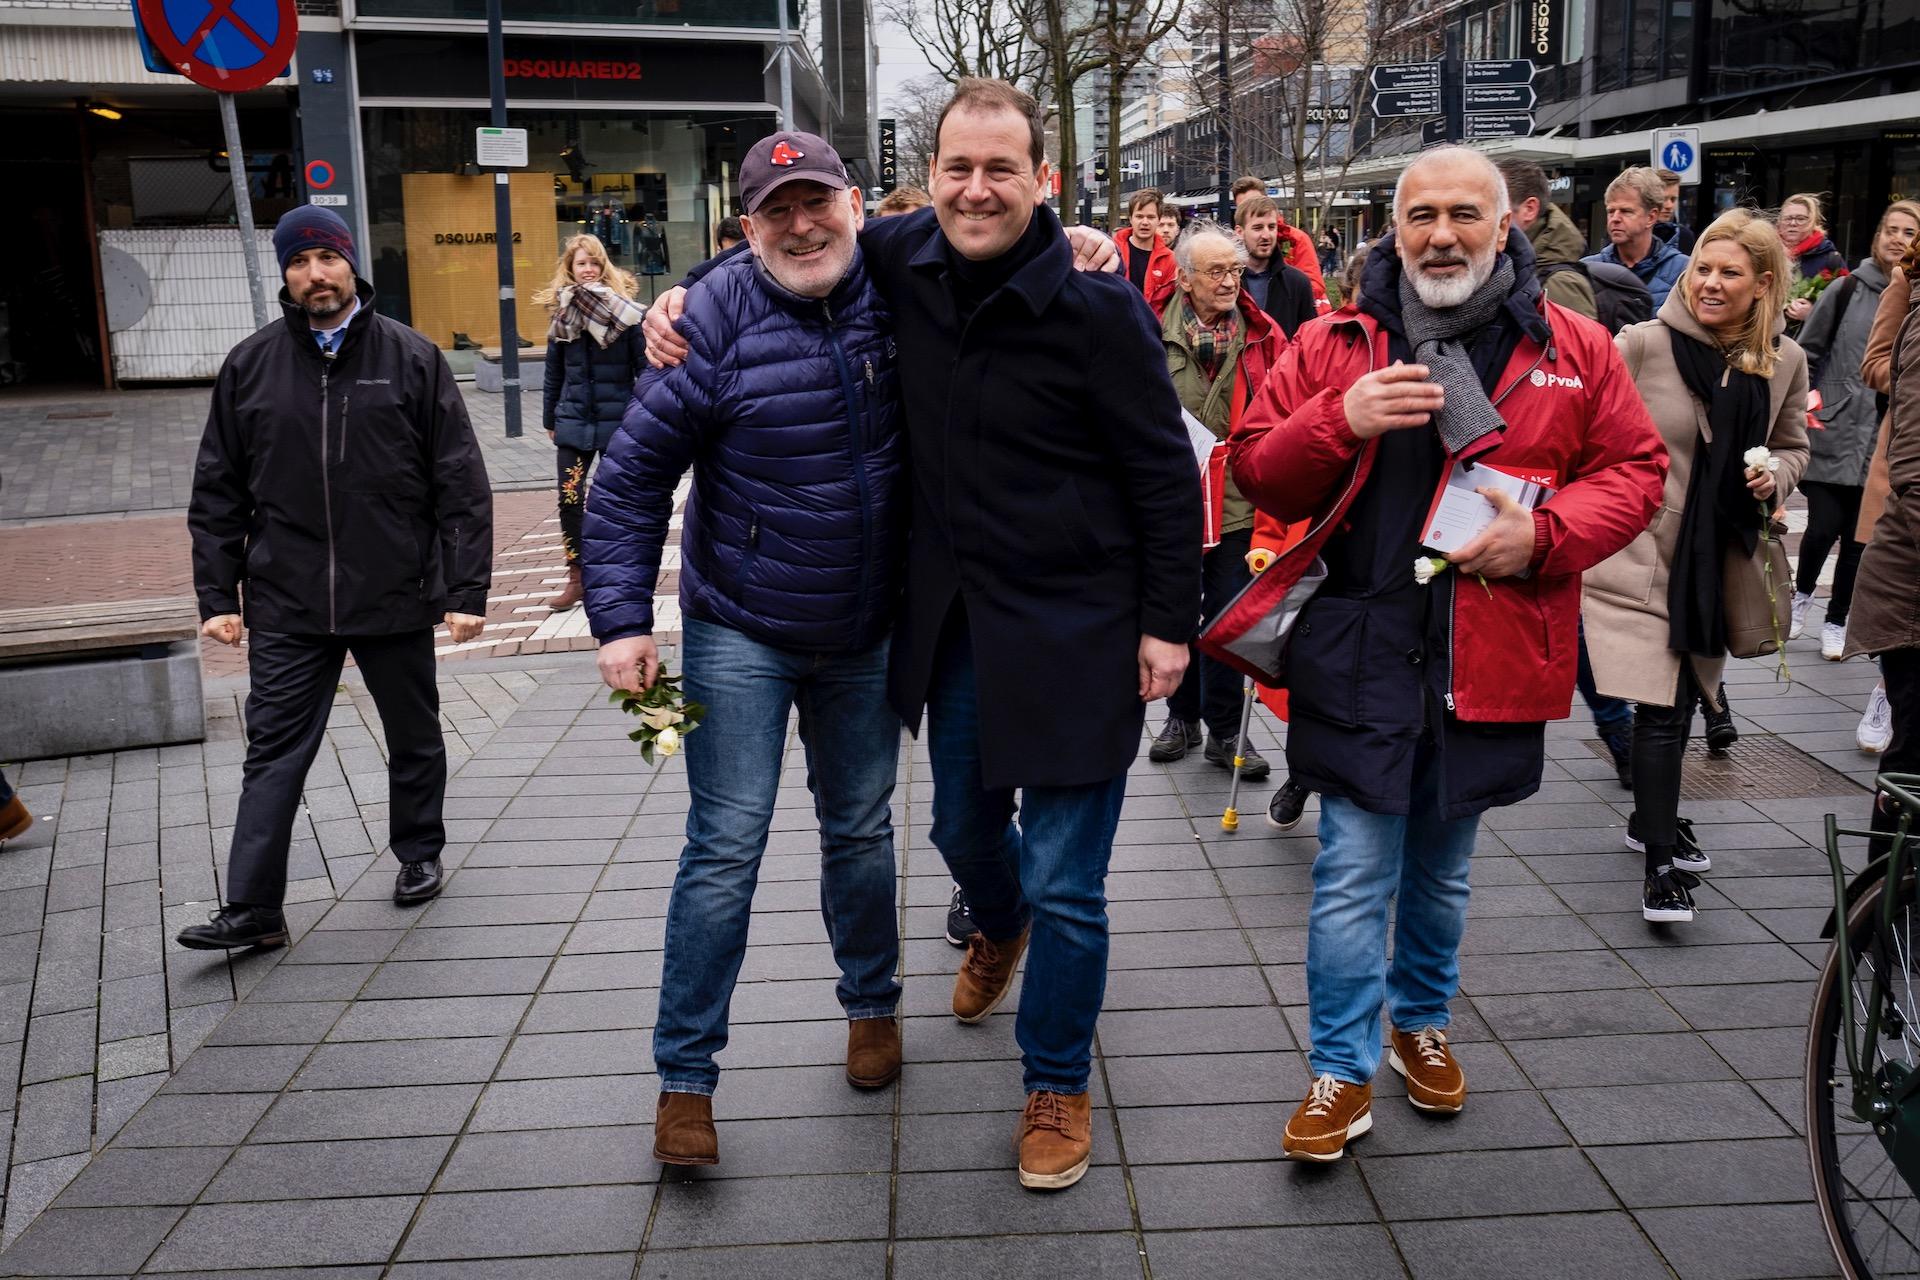 Nederland, Rotterdam, 16032019 - Frans Timmermans op campagne in Rotterdam voor de Europese verkiezingen.